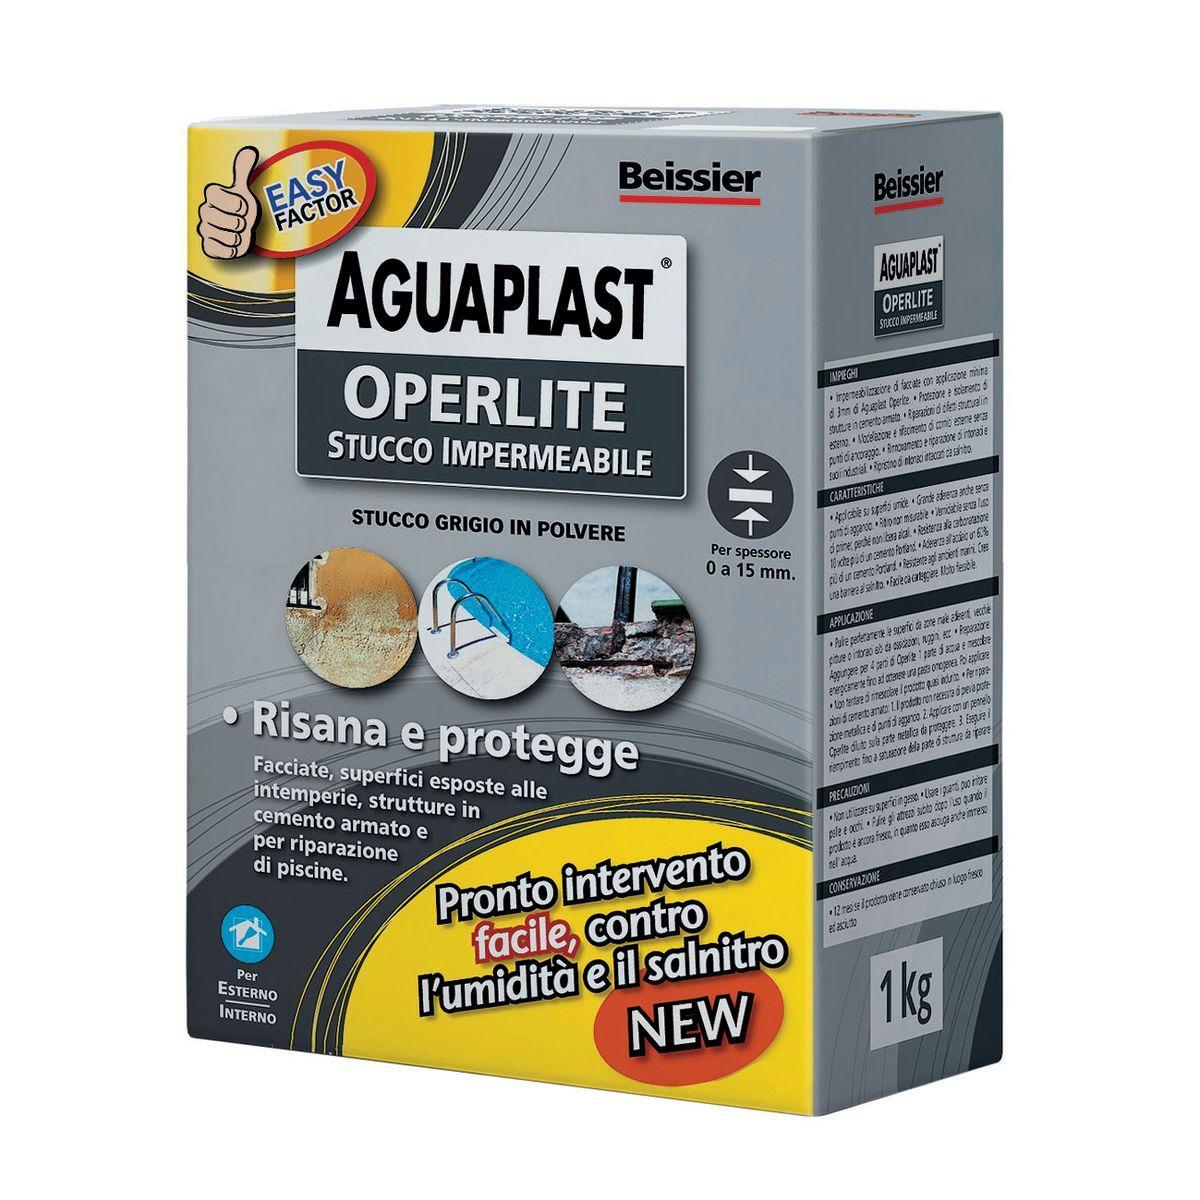 Stucco in polvere aguaplast operlite ruvido grigio 1 kg for Stendibiancheria leroy merlin